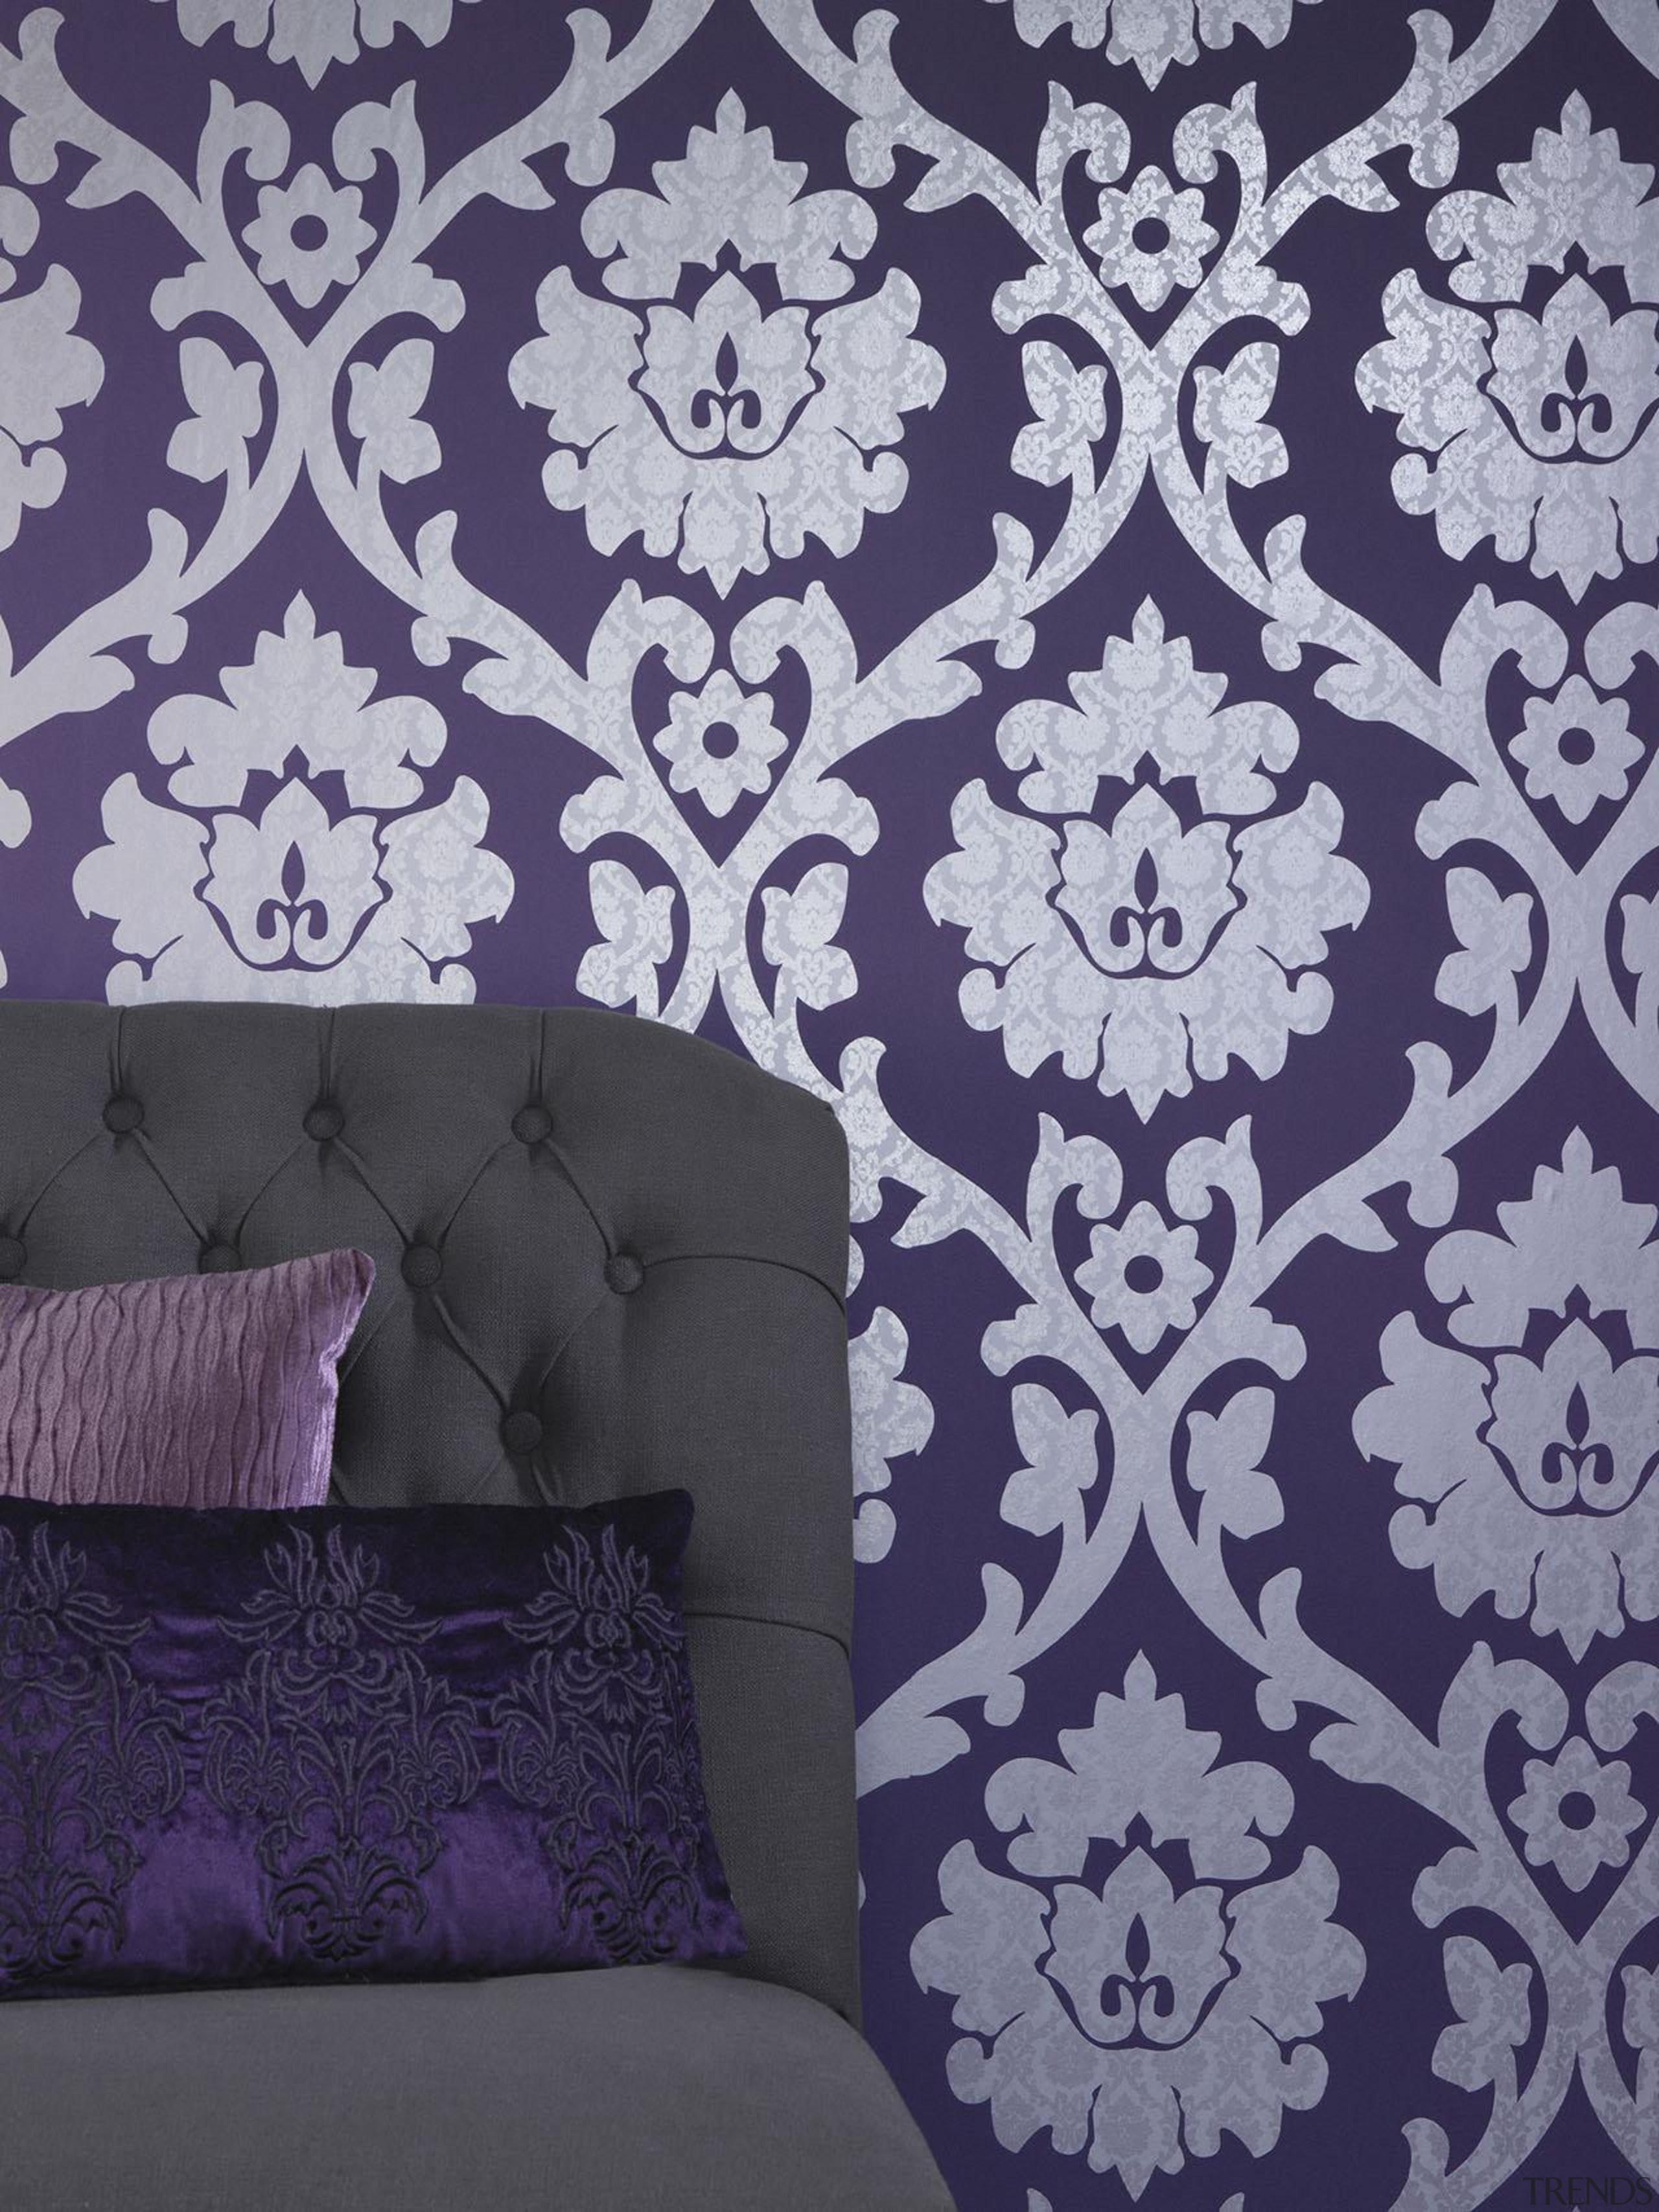 Brocante II Range - Brocante II Range - interior design, lilac, pattern, purple, violet, wall, wallpaper, gray, purple